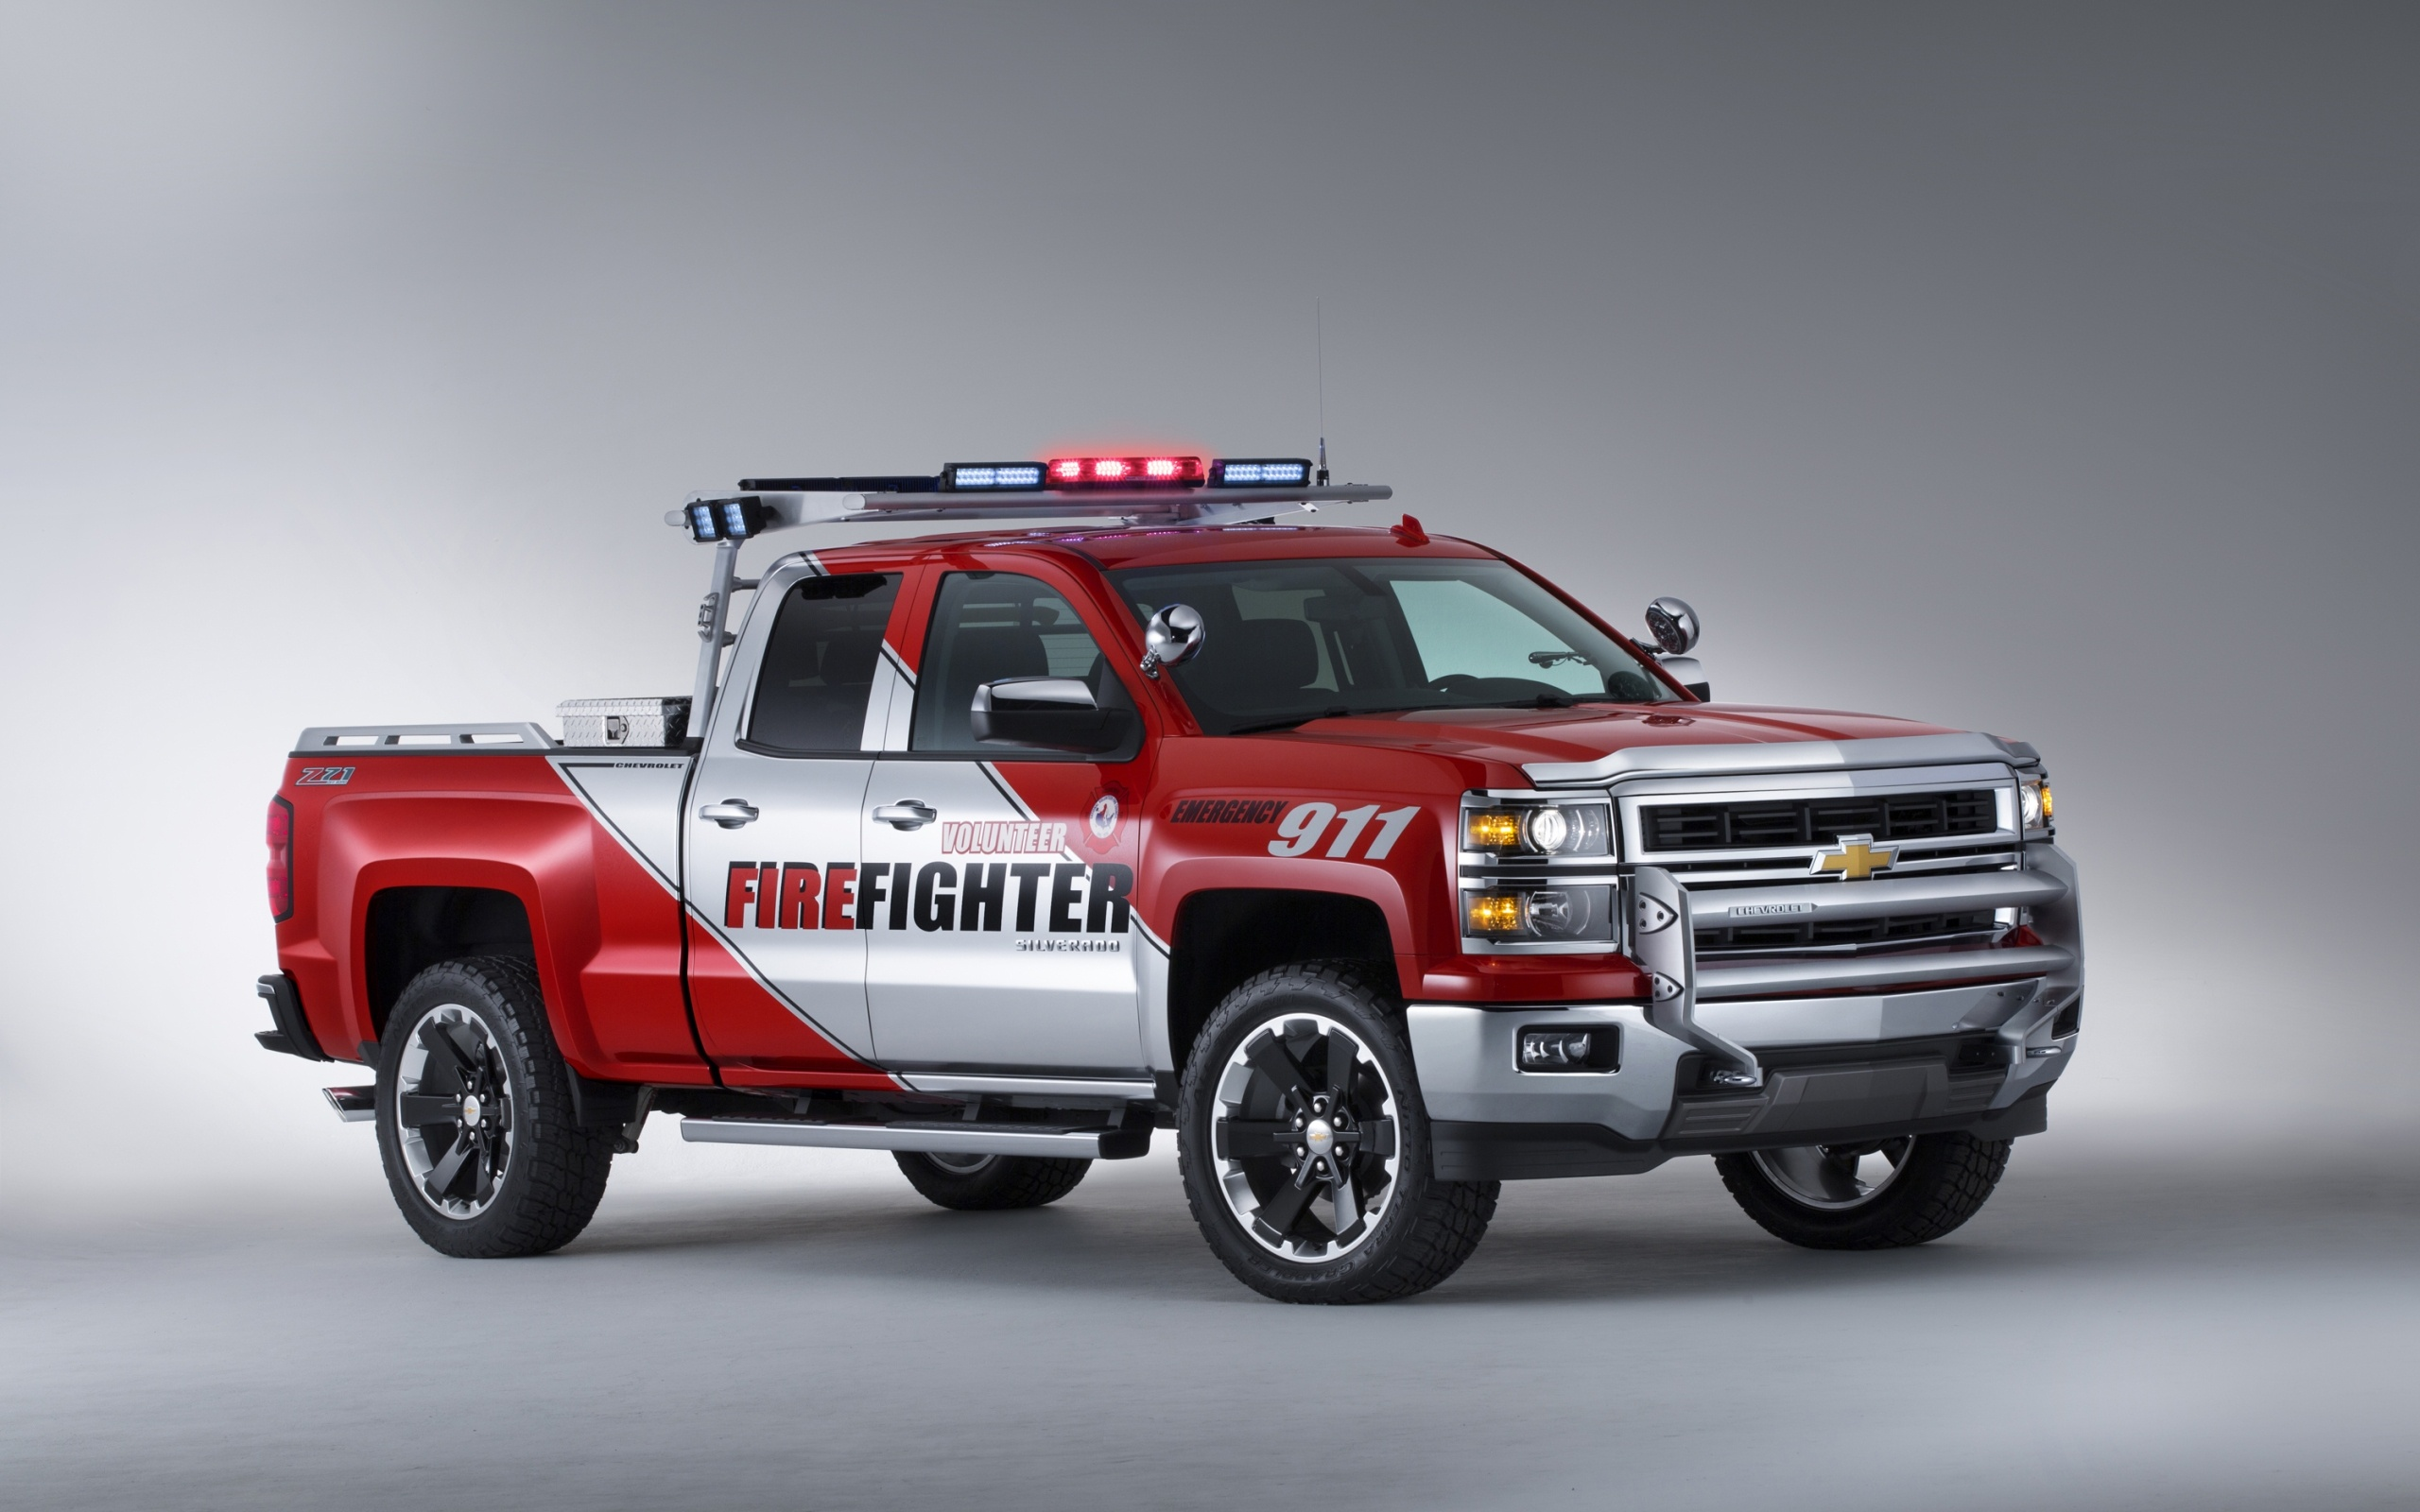 Chevrolet Silverado Firefighter 2013 Wallpapers